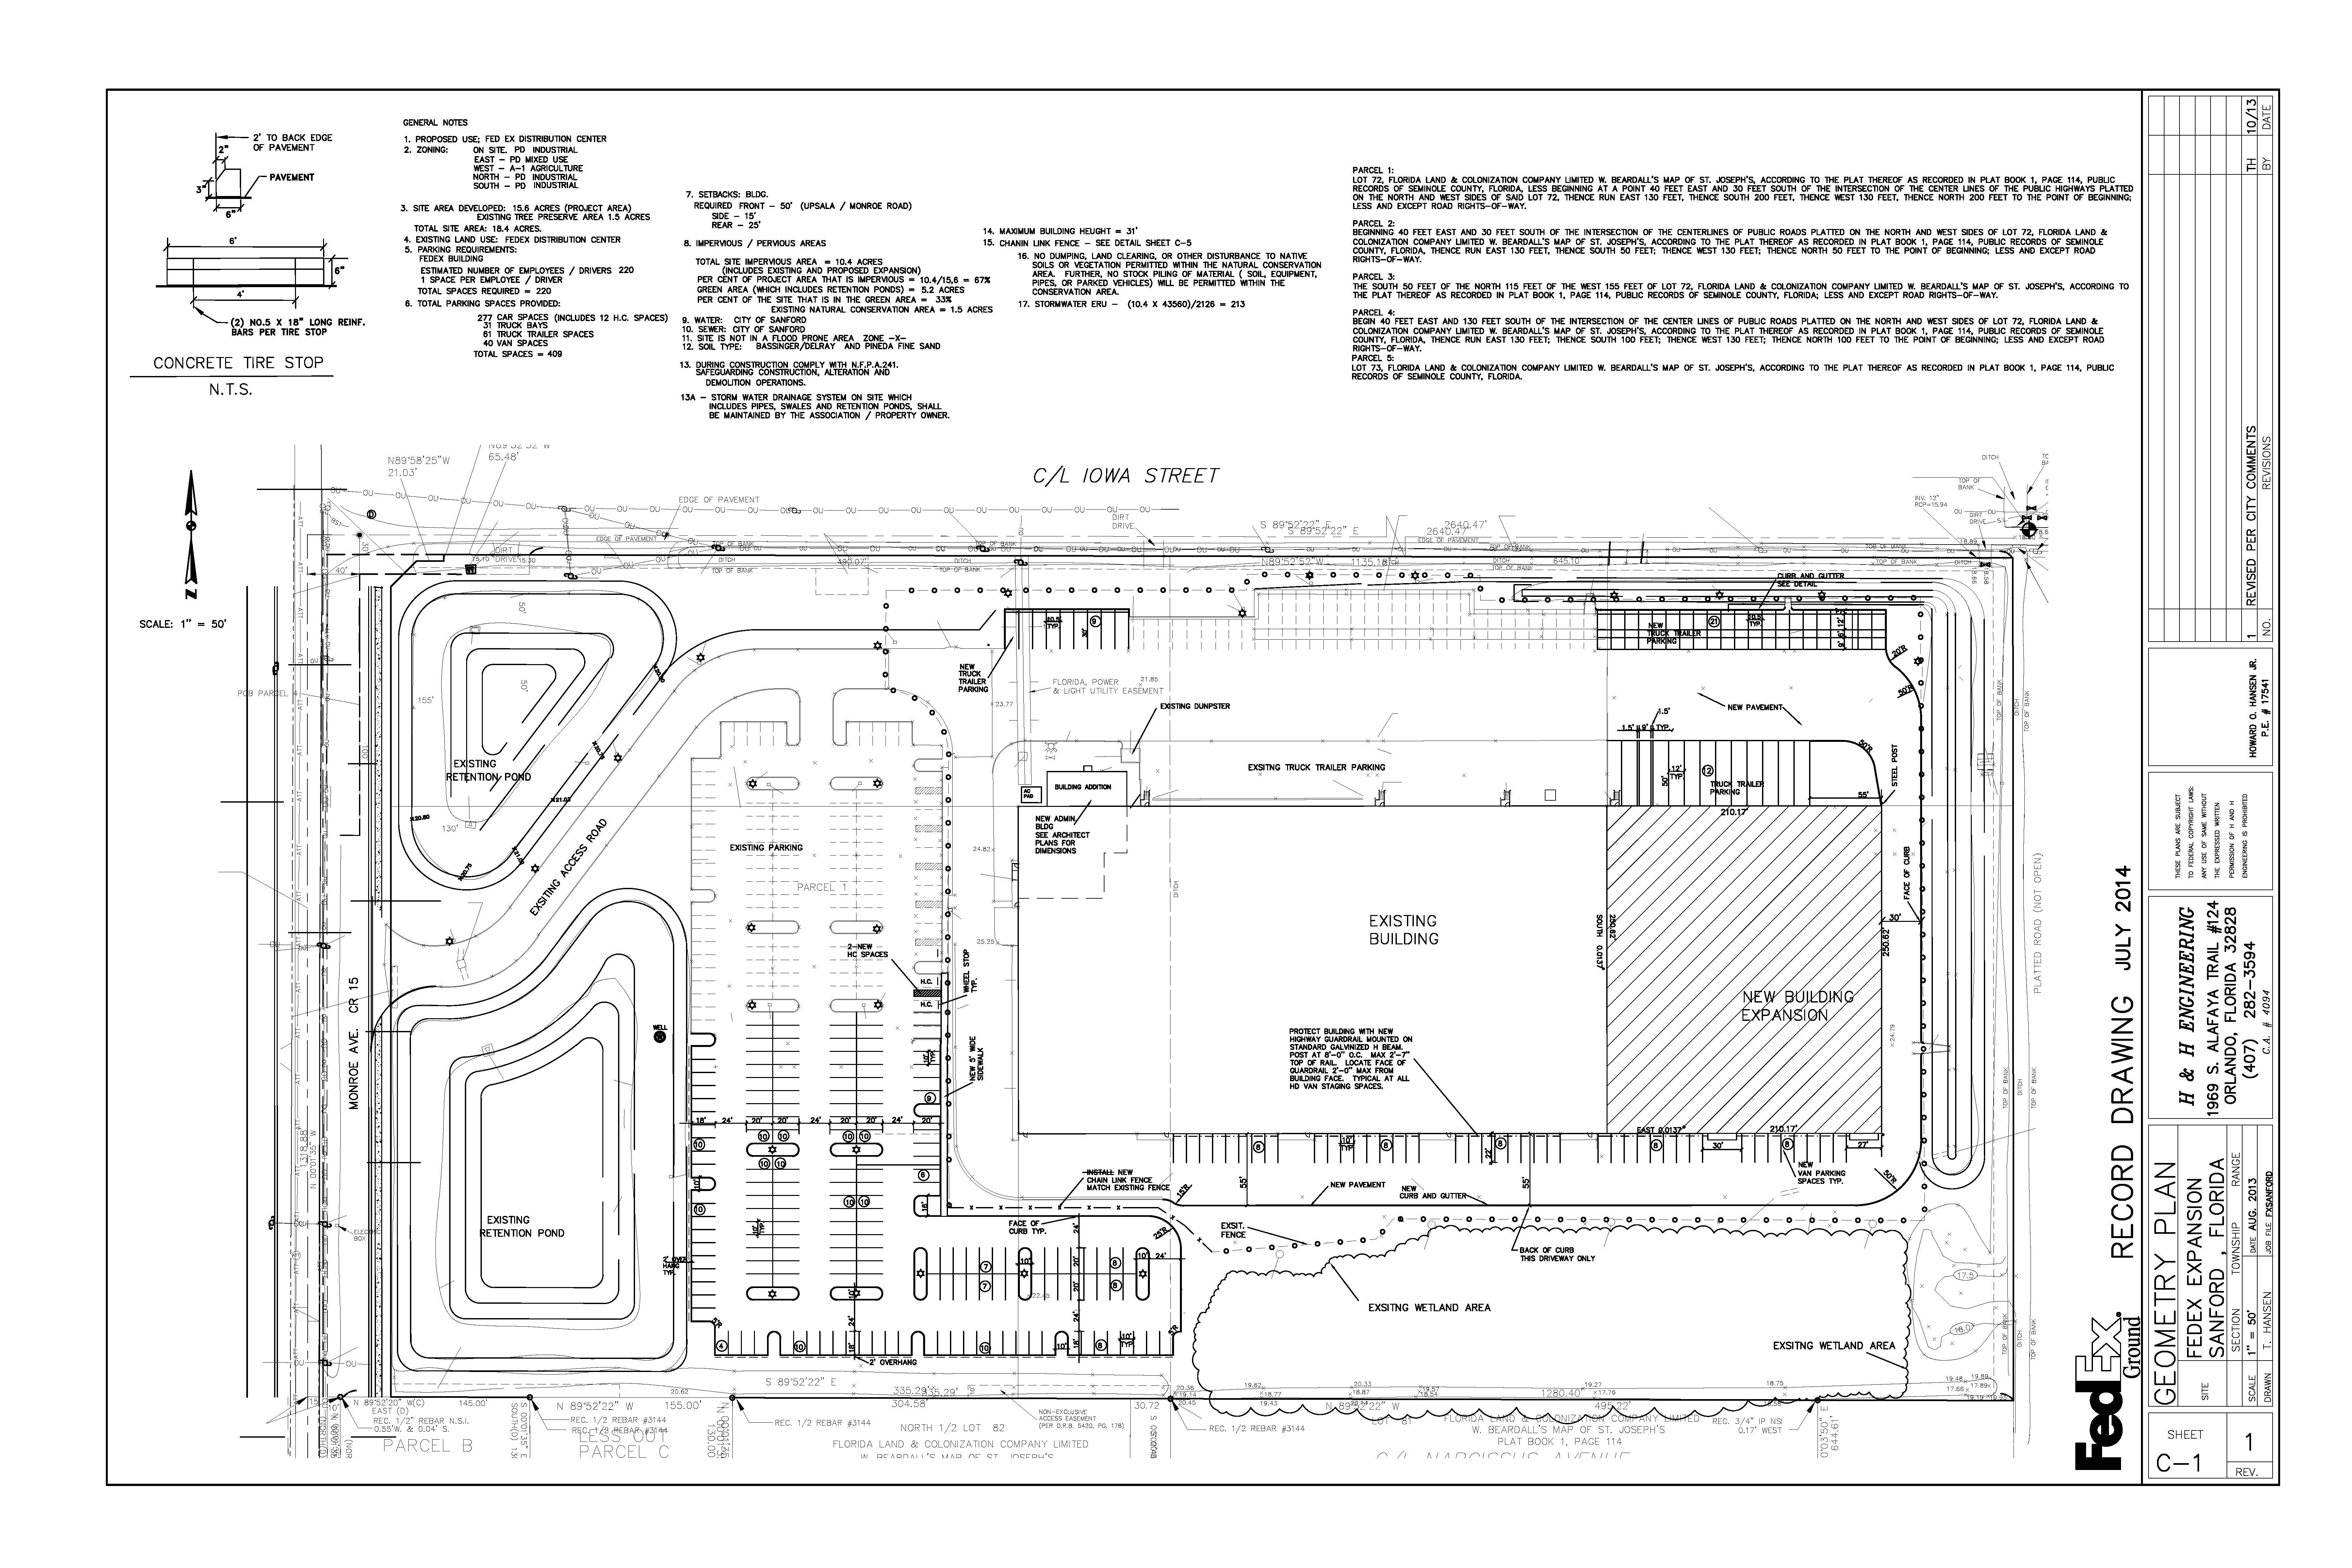 FEDEX SANFORD FLORIDA CIVIL ENGINEERING DESIGN AND PERMITTING